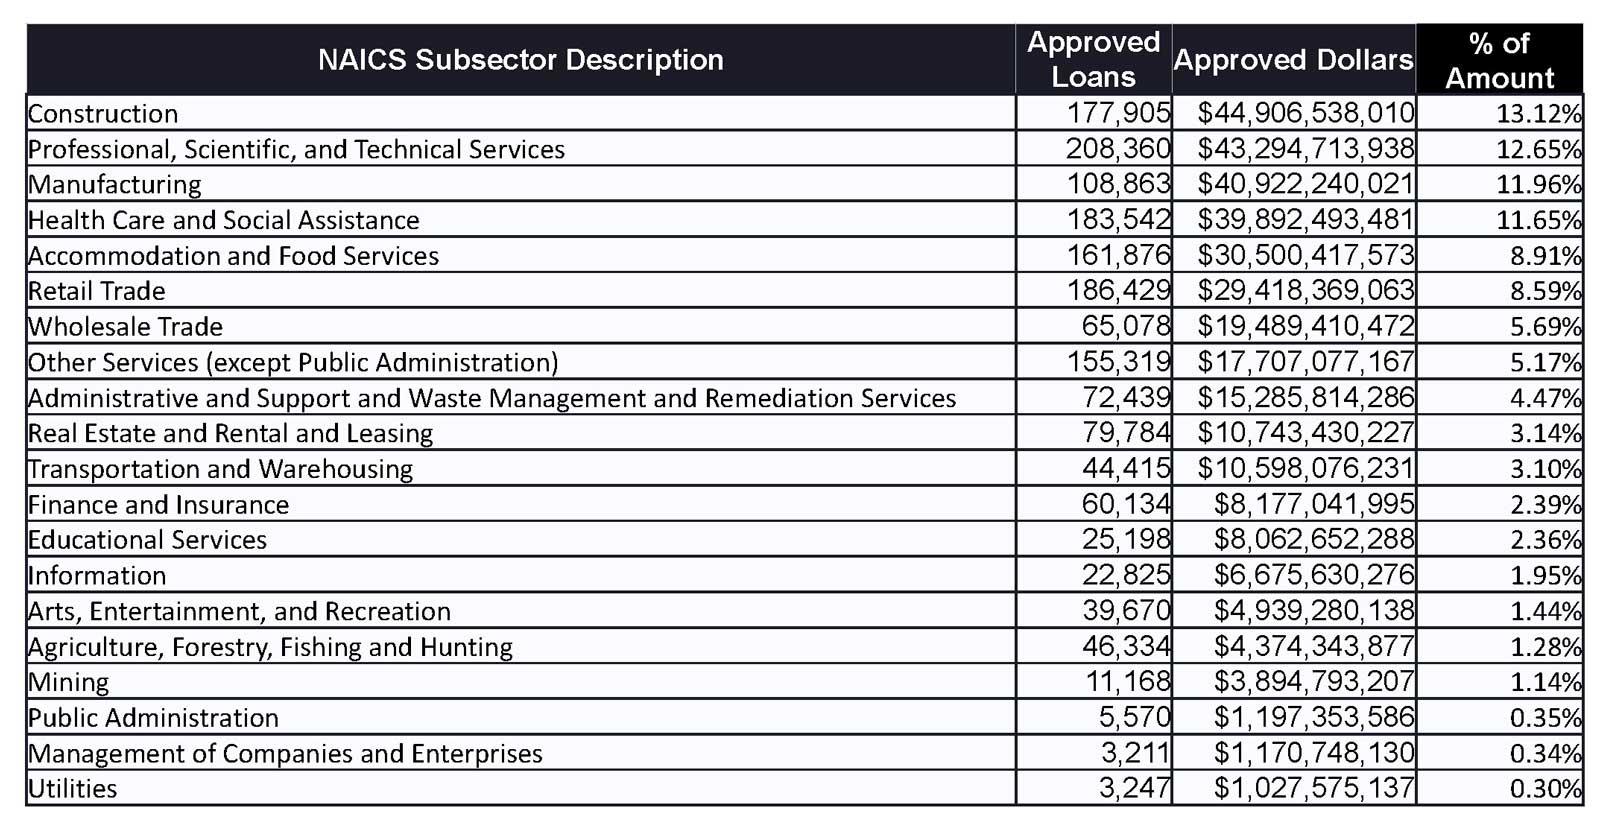 NAICS Subsector Description